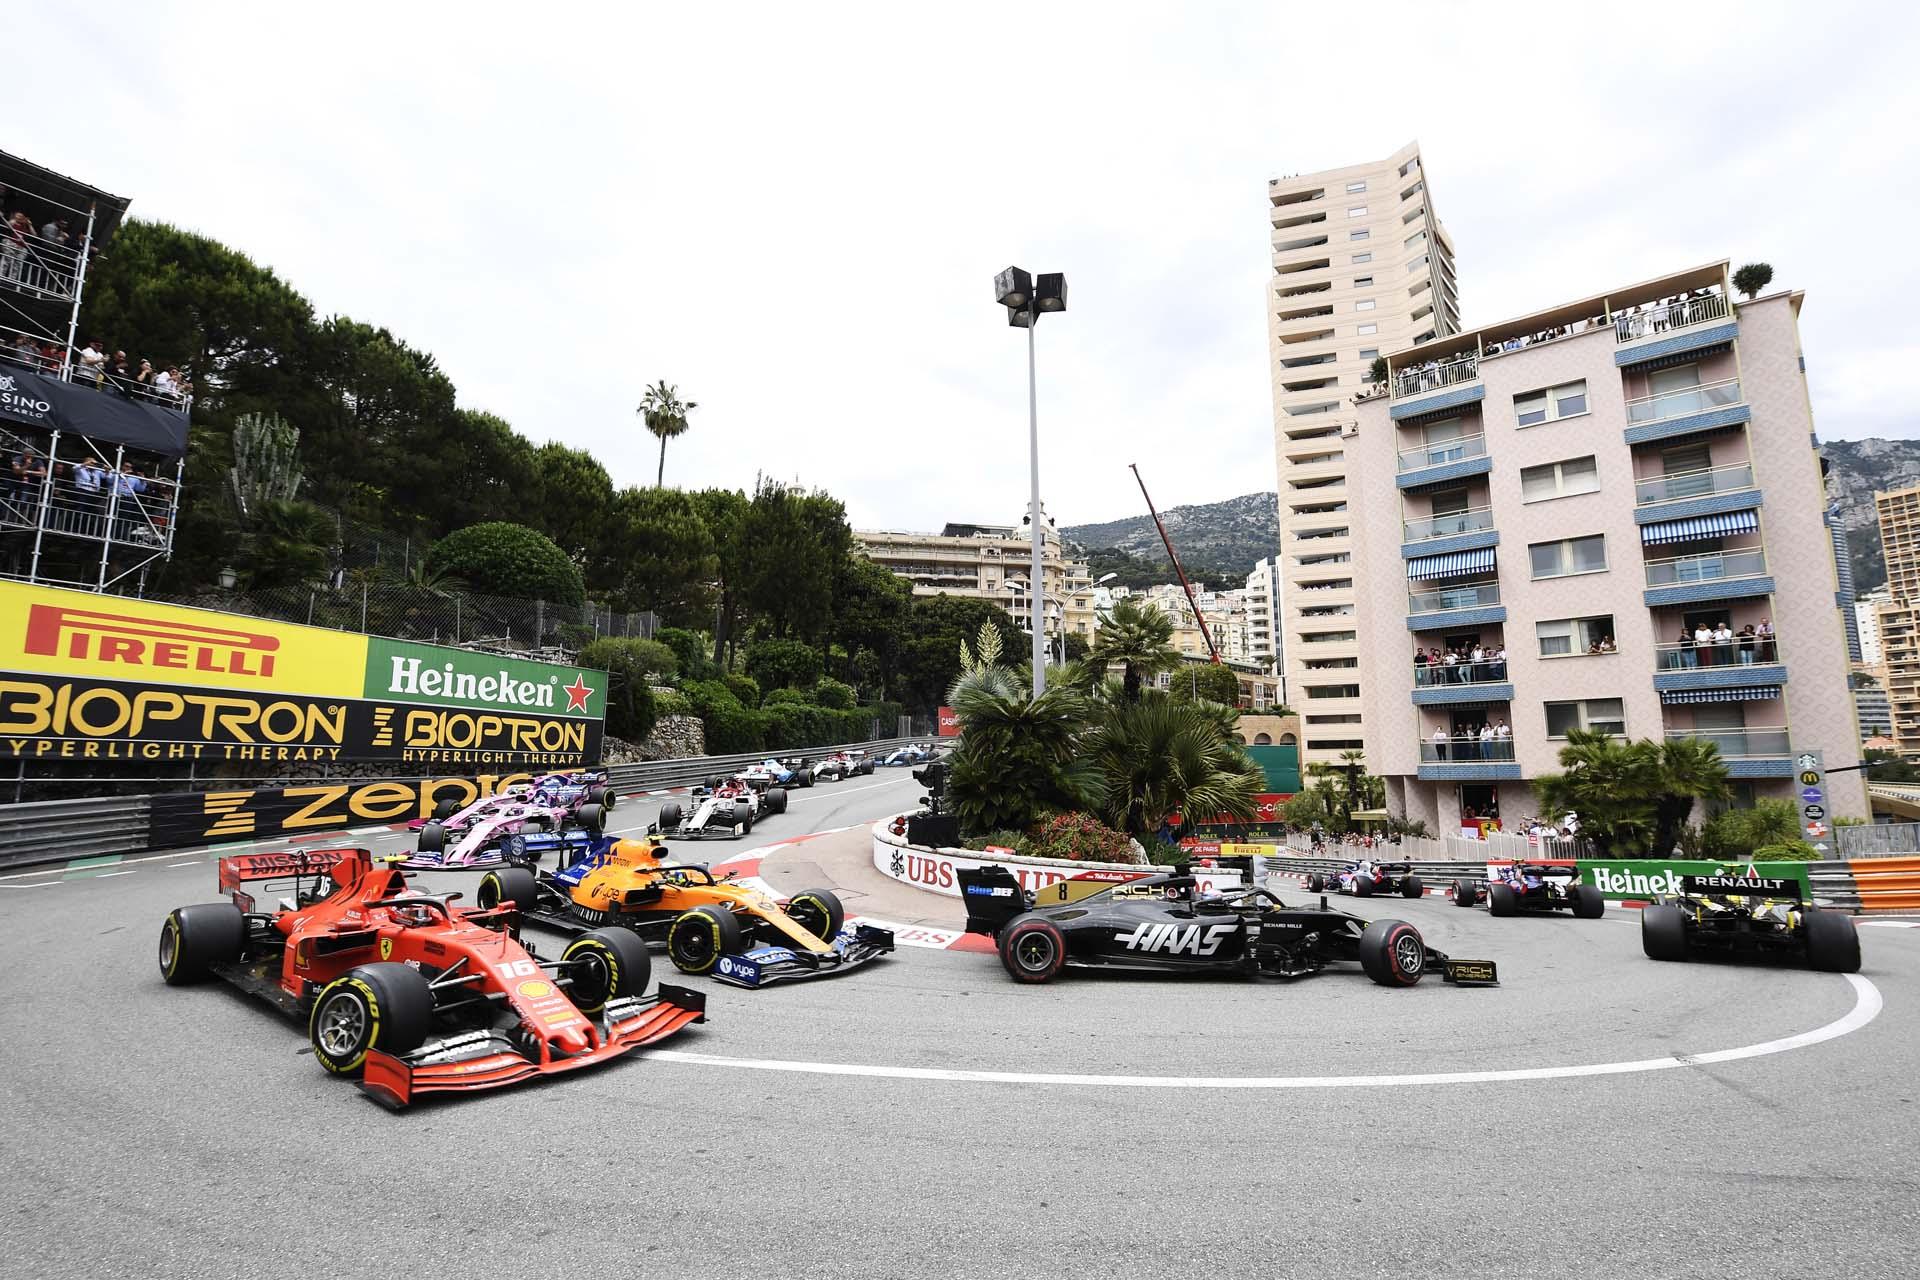 MonacoGP2019_SUN_Pirelli_monacosunday11-435471